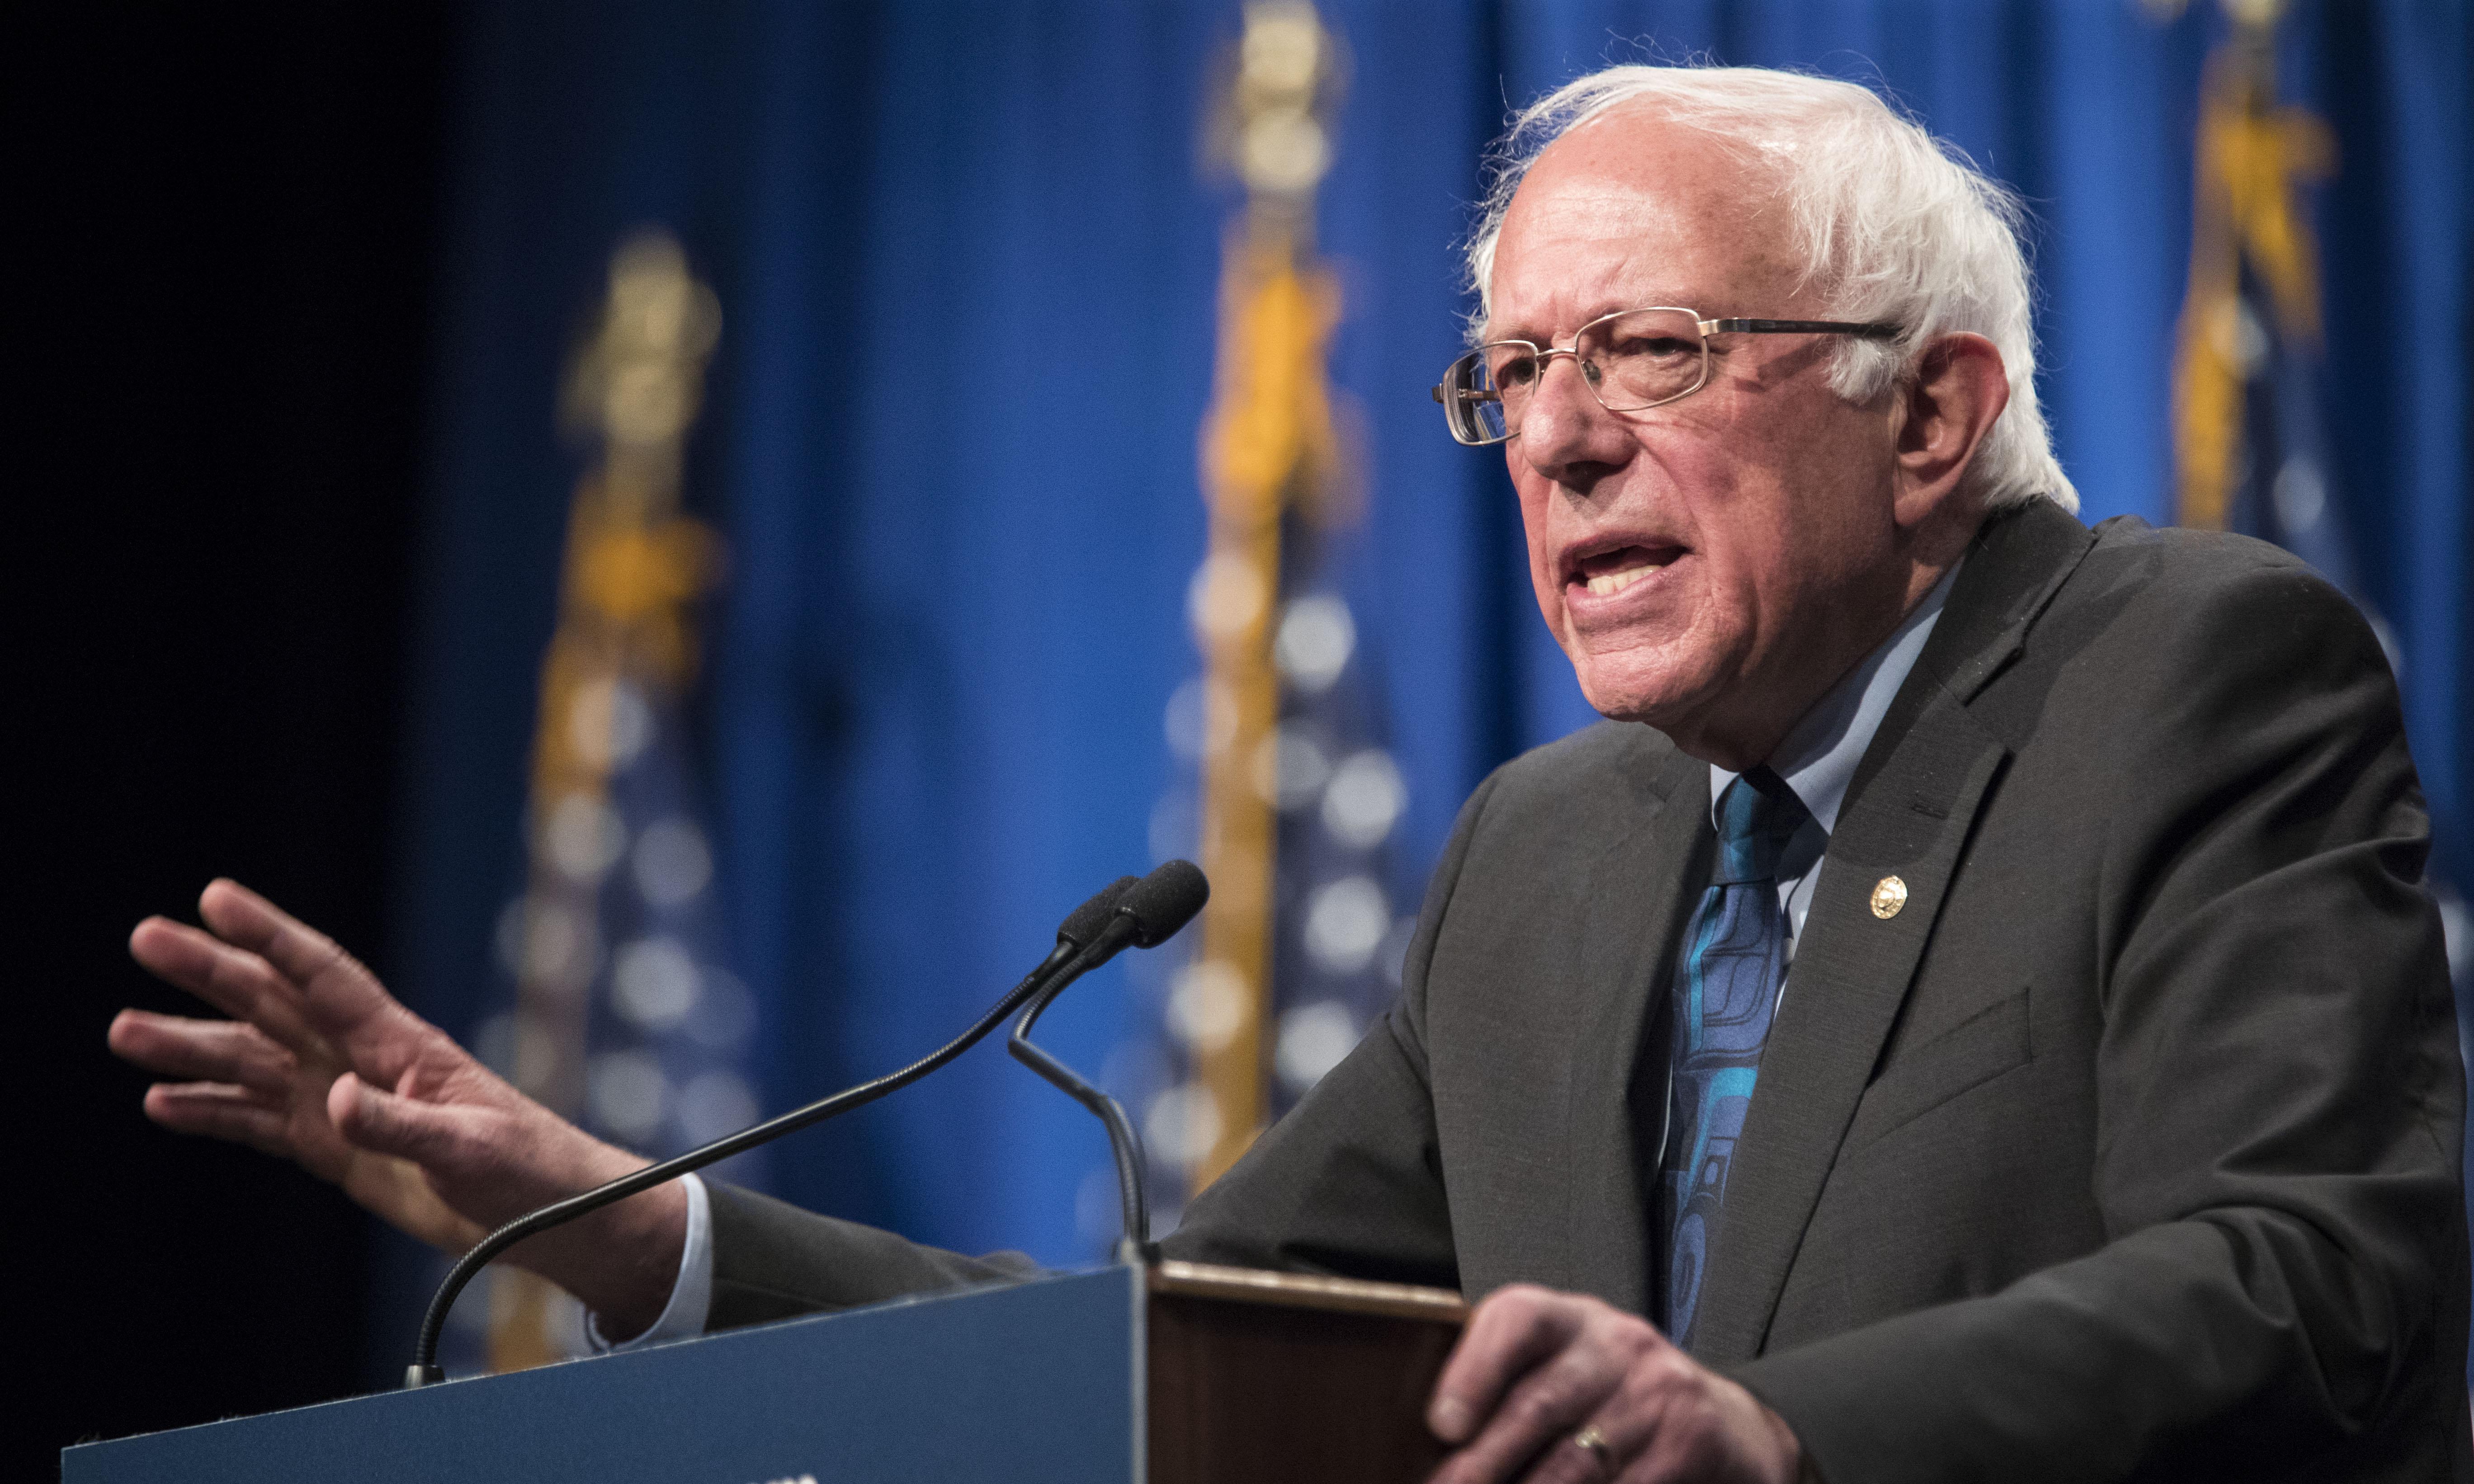 Bernie Sanders just made a brilliant defense of democratic socialism